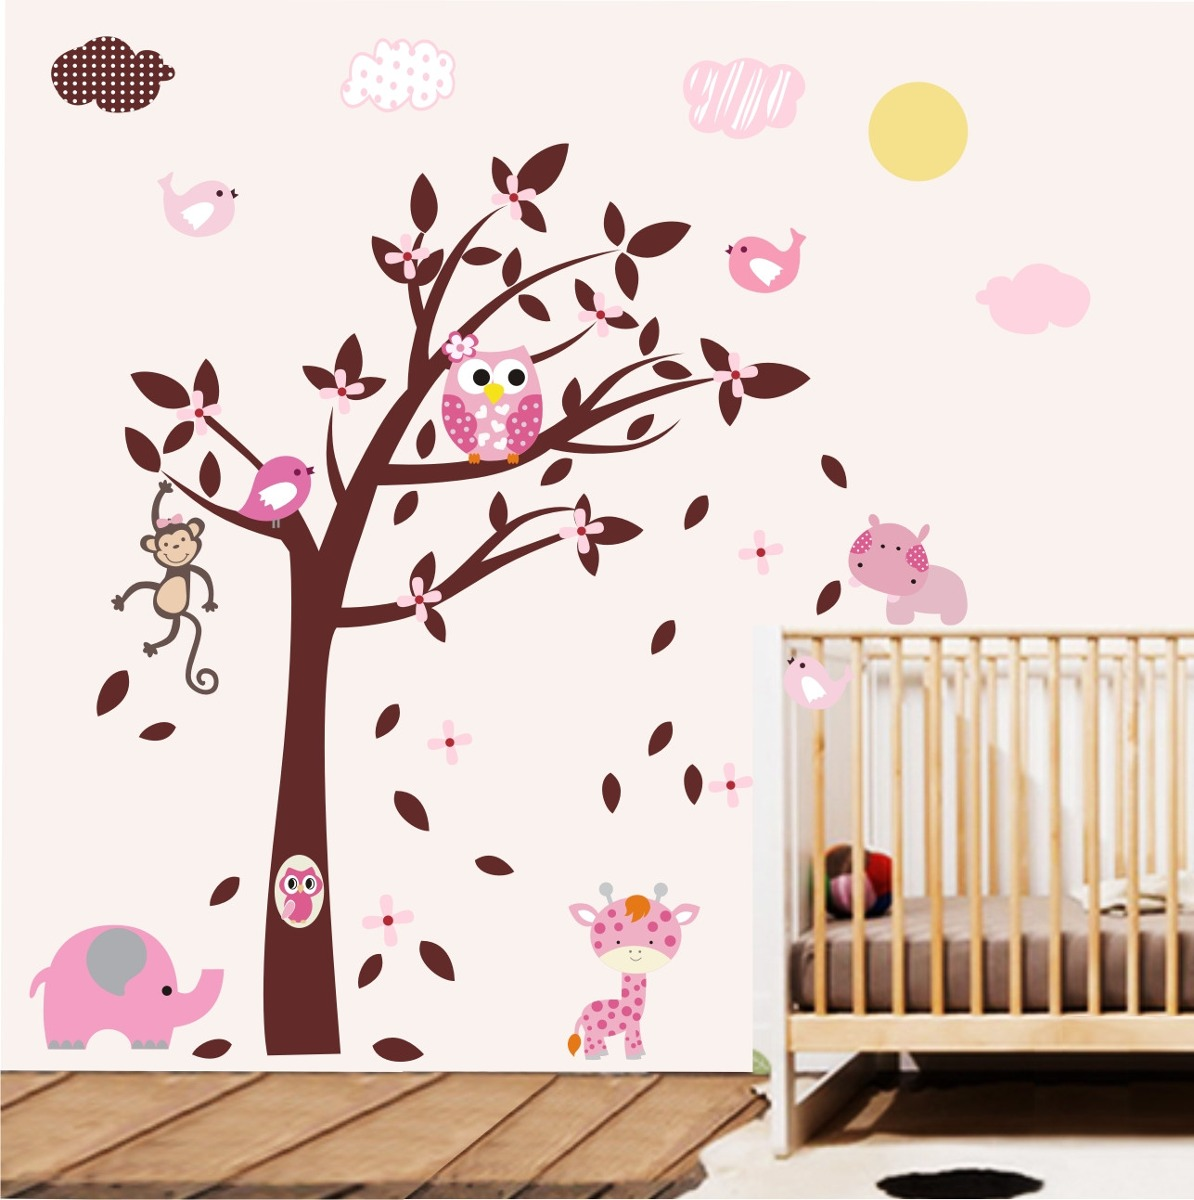 Adesivo papel parede infantil coruja safari arvore zoo m97 r 148 00 em mercado livre - Papel decorativo infantil ...